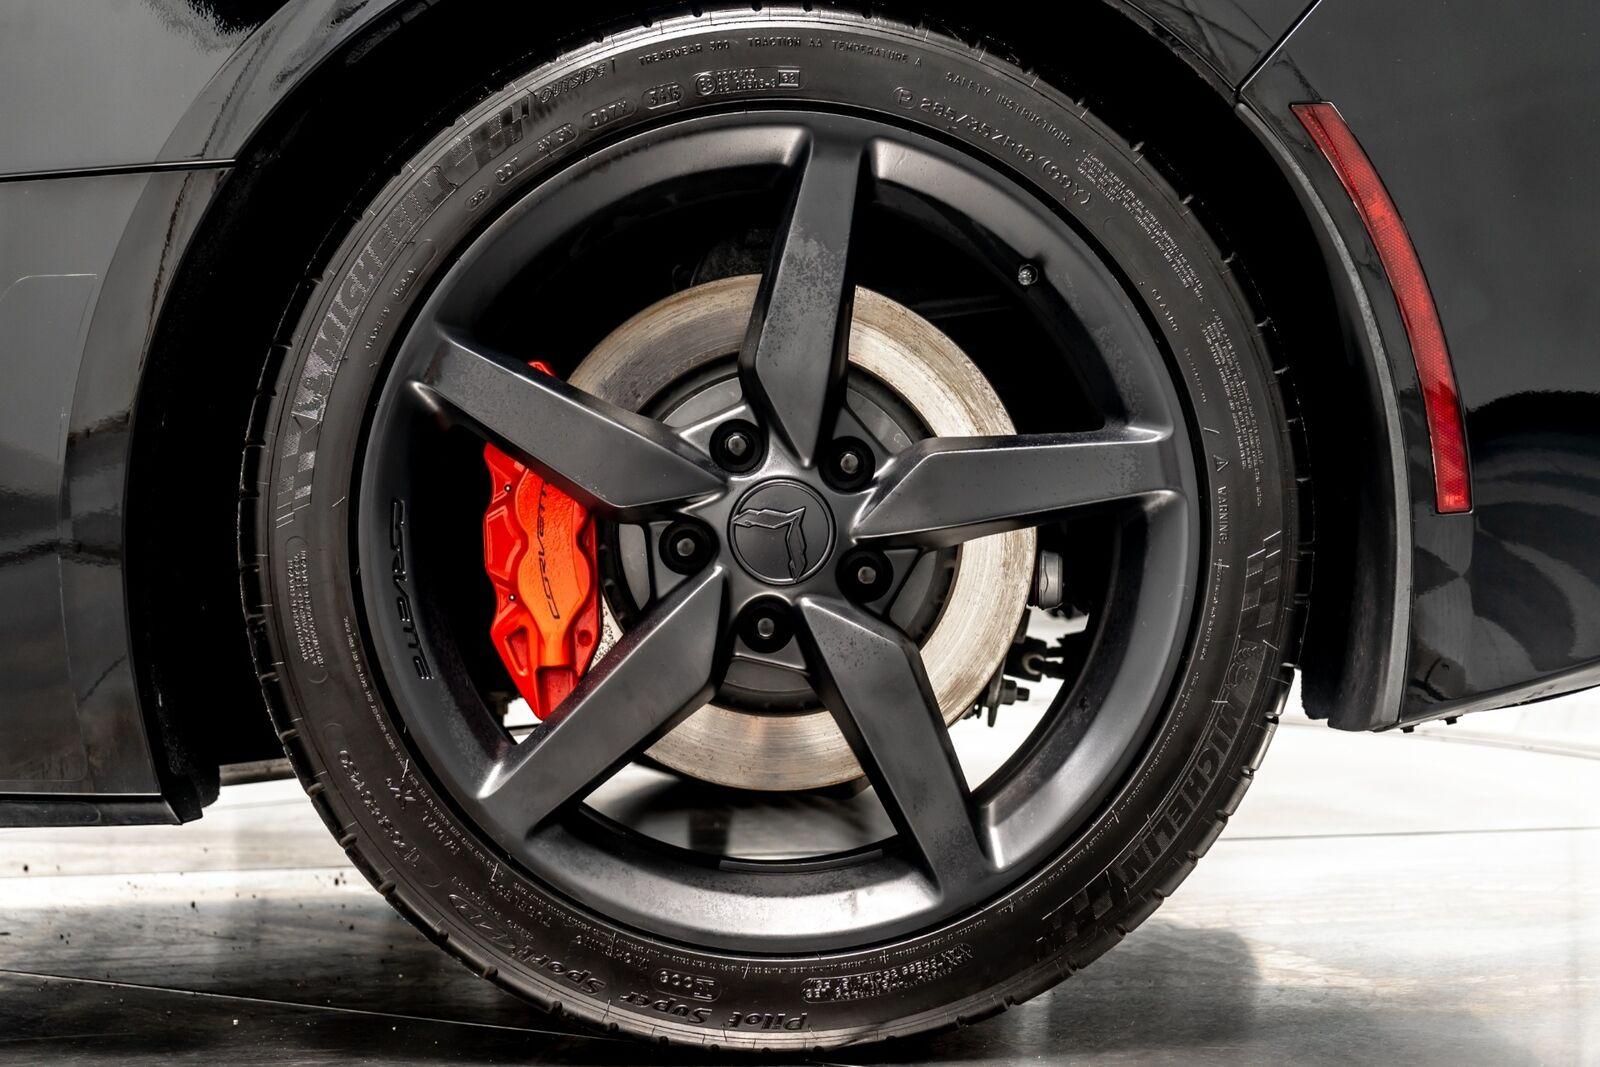 2014 Black Chevrolet Corvette Convertible 2LT   C7 Corvette Photo 10